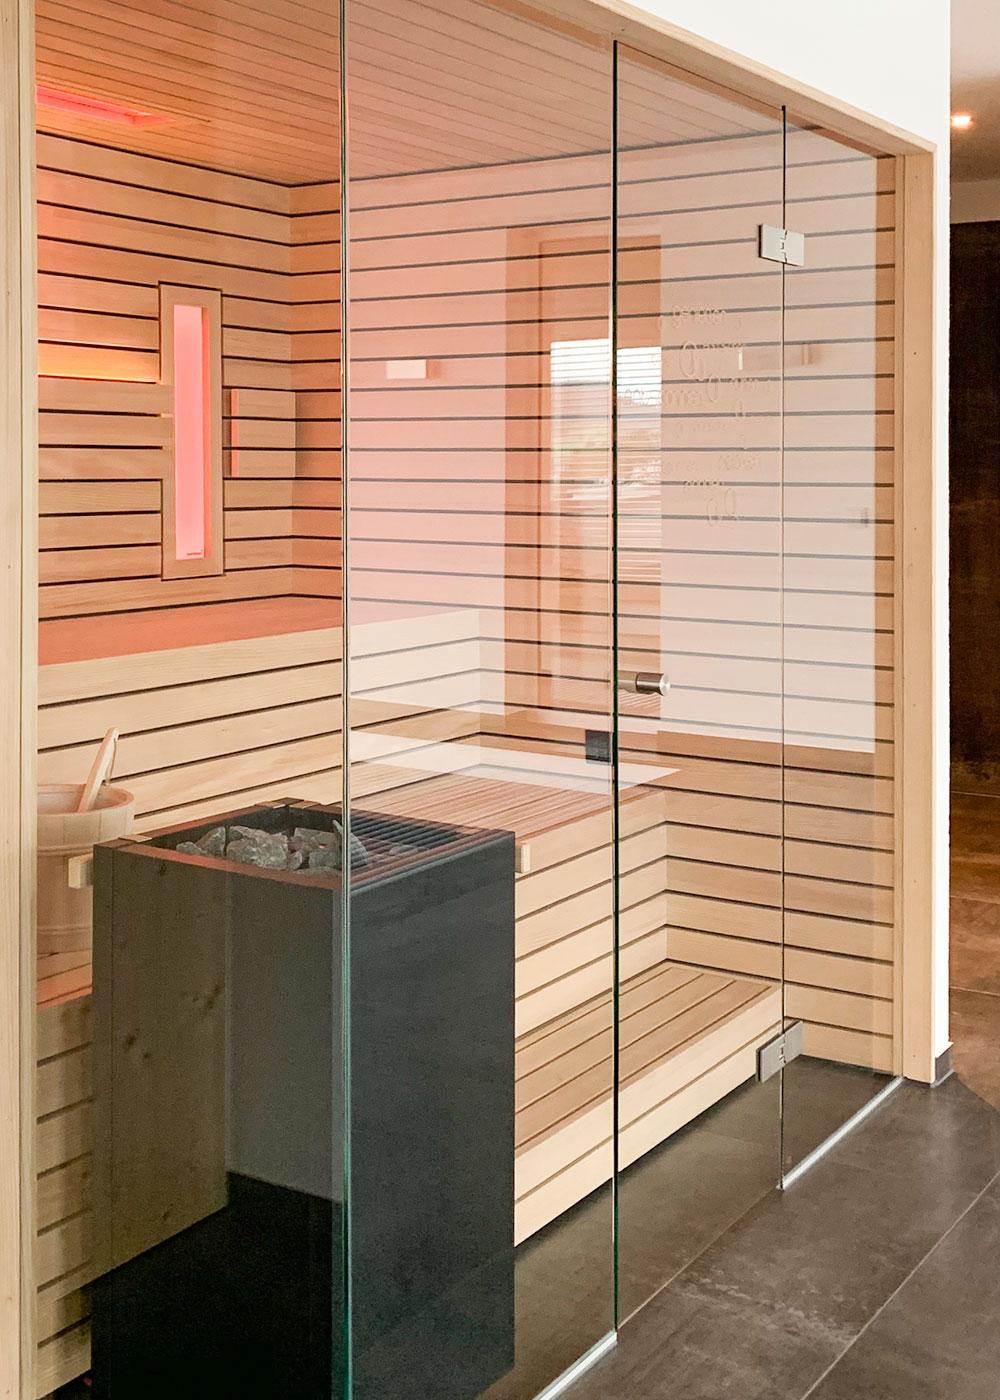 KOERNER Sauna mit Über-Eck-Verglasung